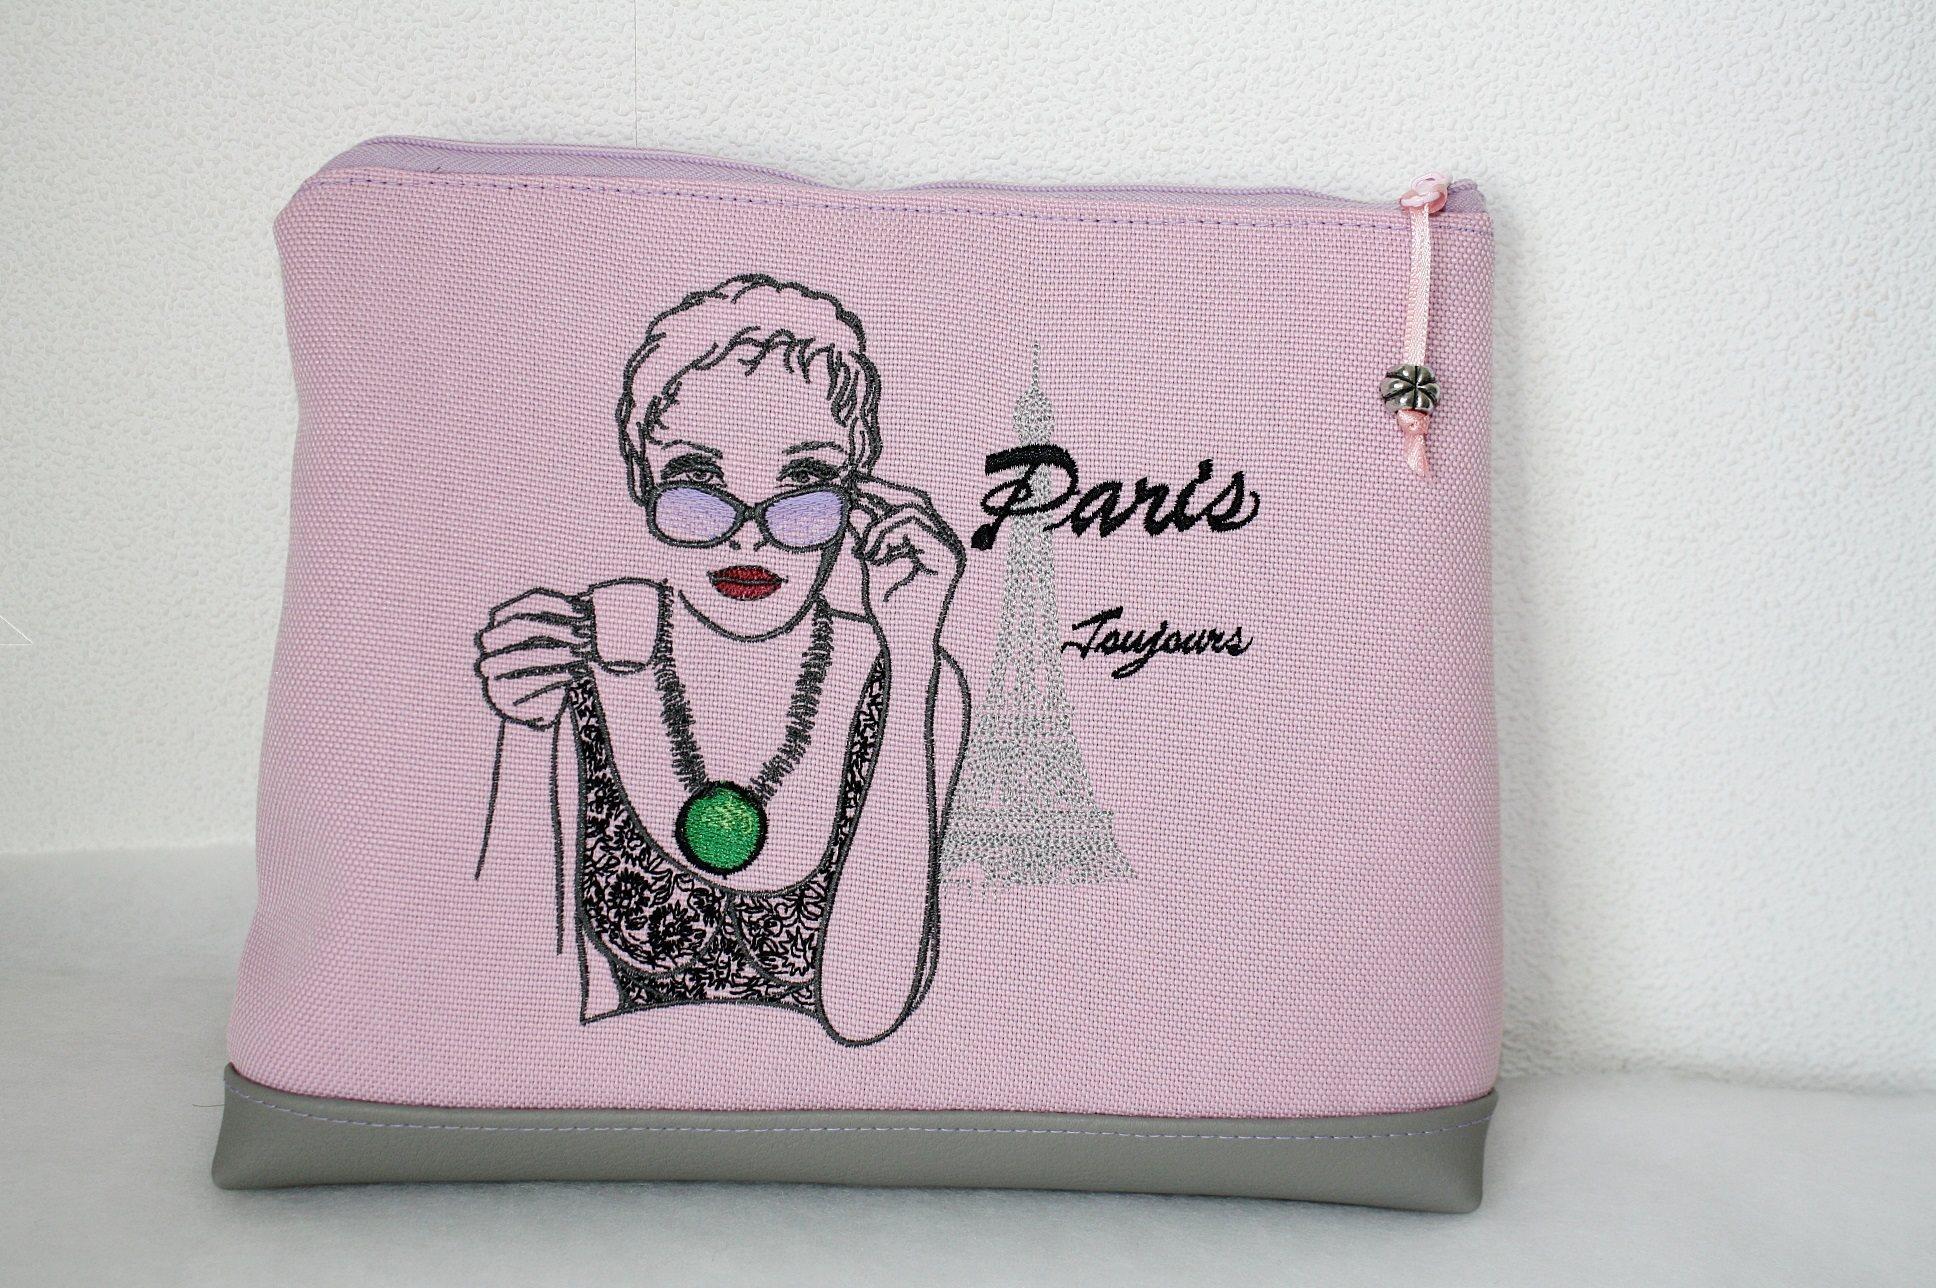 Handbag with Paris Toujours machine embroidery design